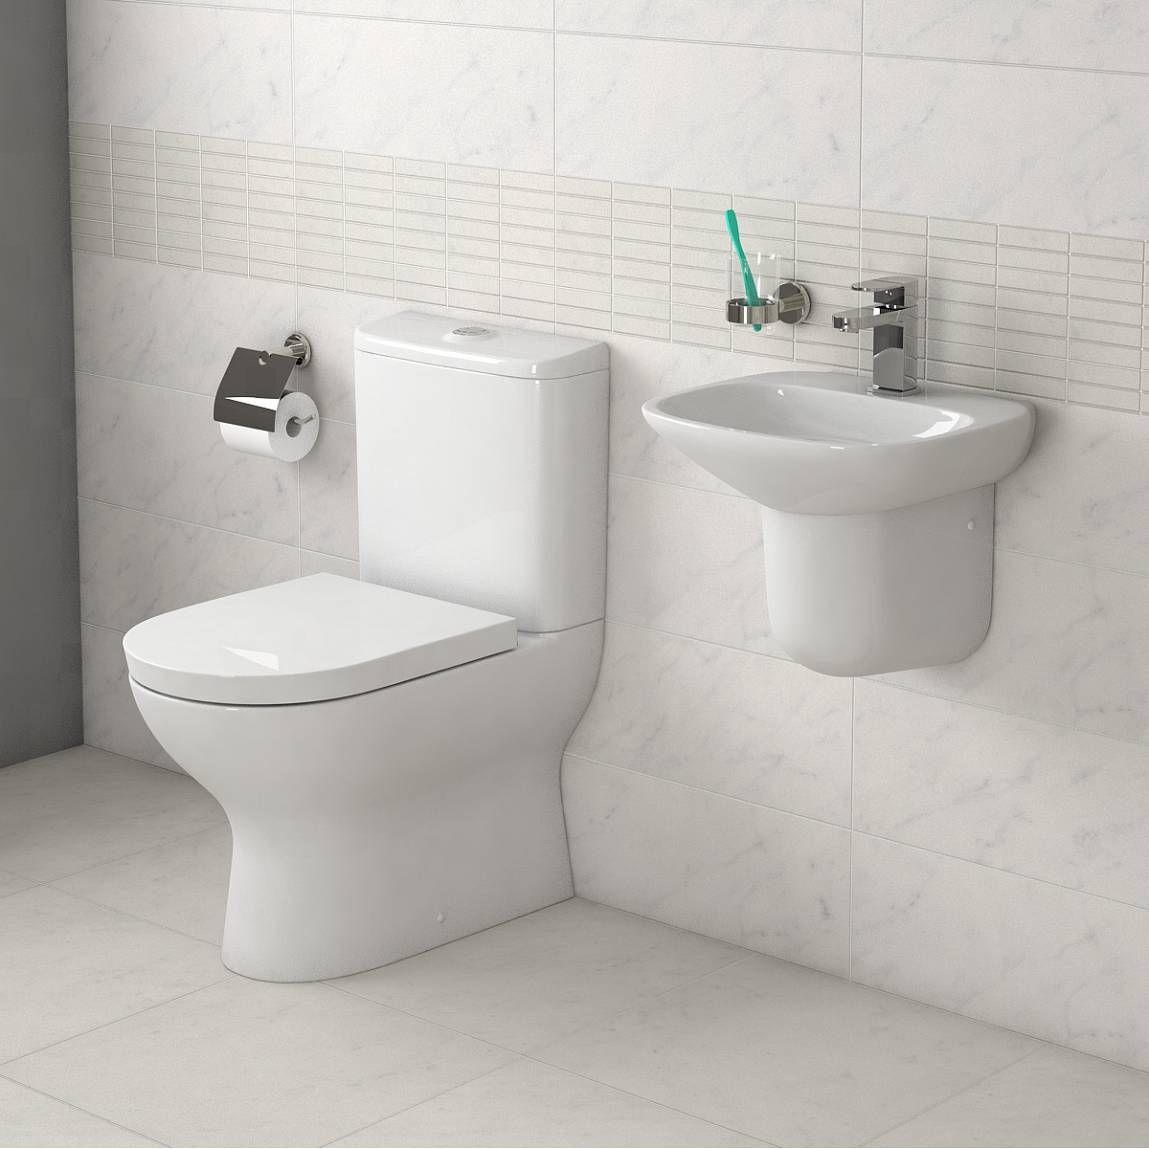 Fairbanks  Piece Cloakroom Suite Small Toilet Pinterest - Small 4 piece bathroom